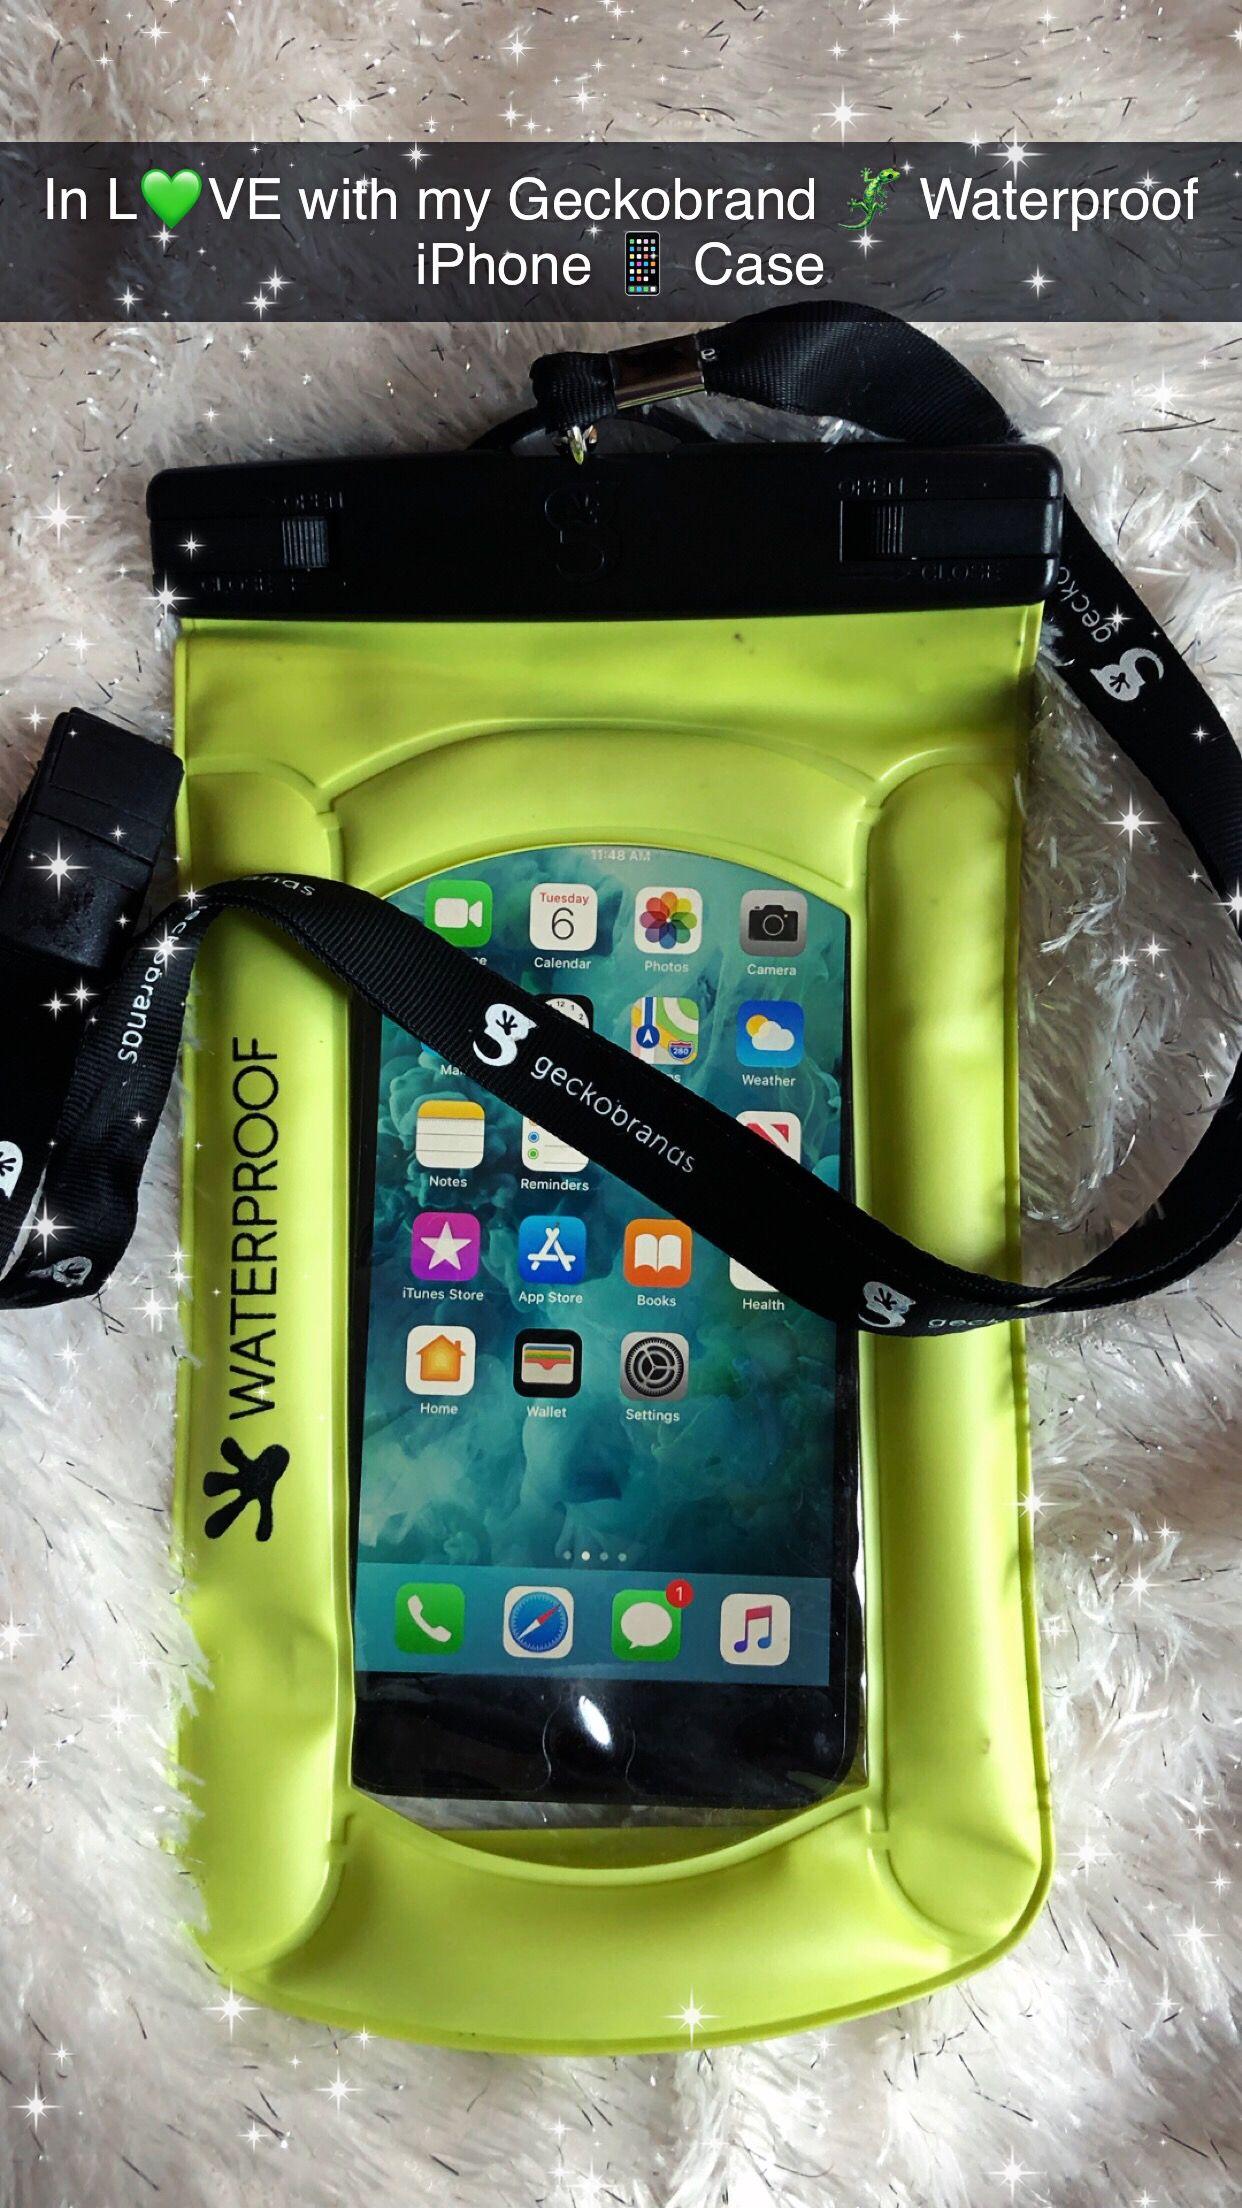 Geckobrand Waterproof iPhone case   Works great underwater ...